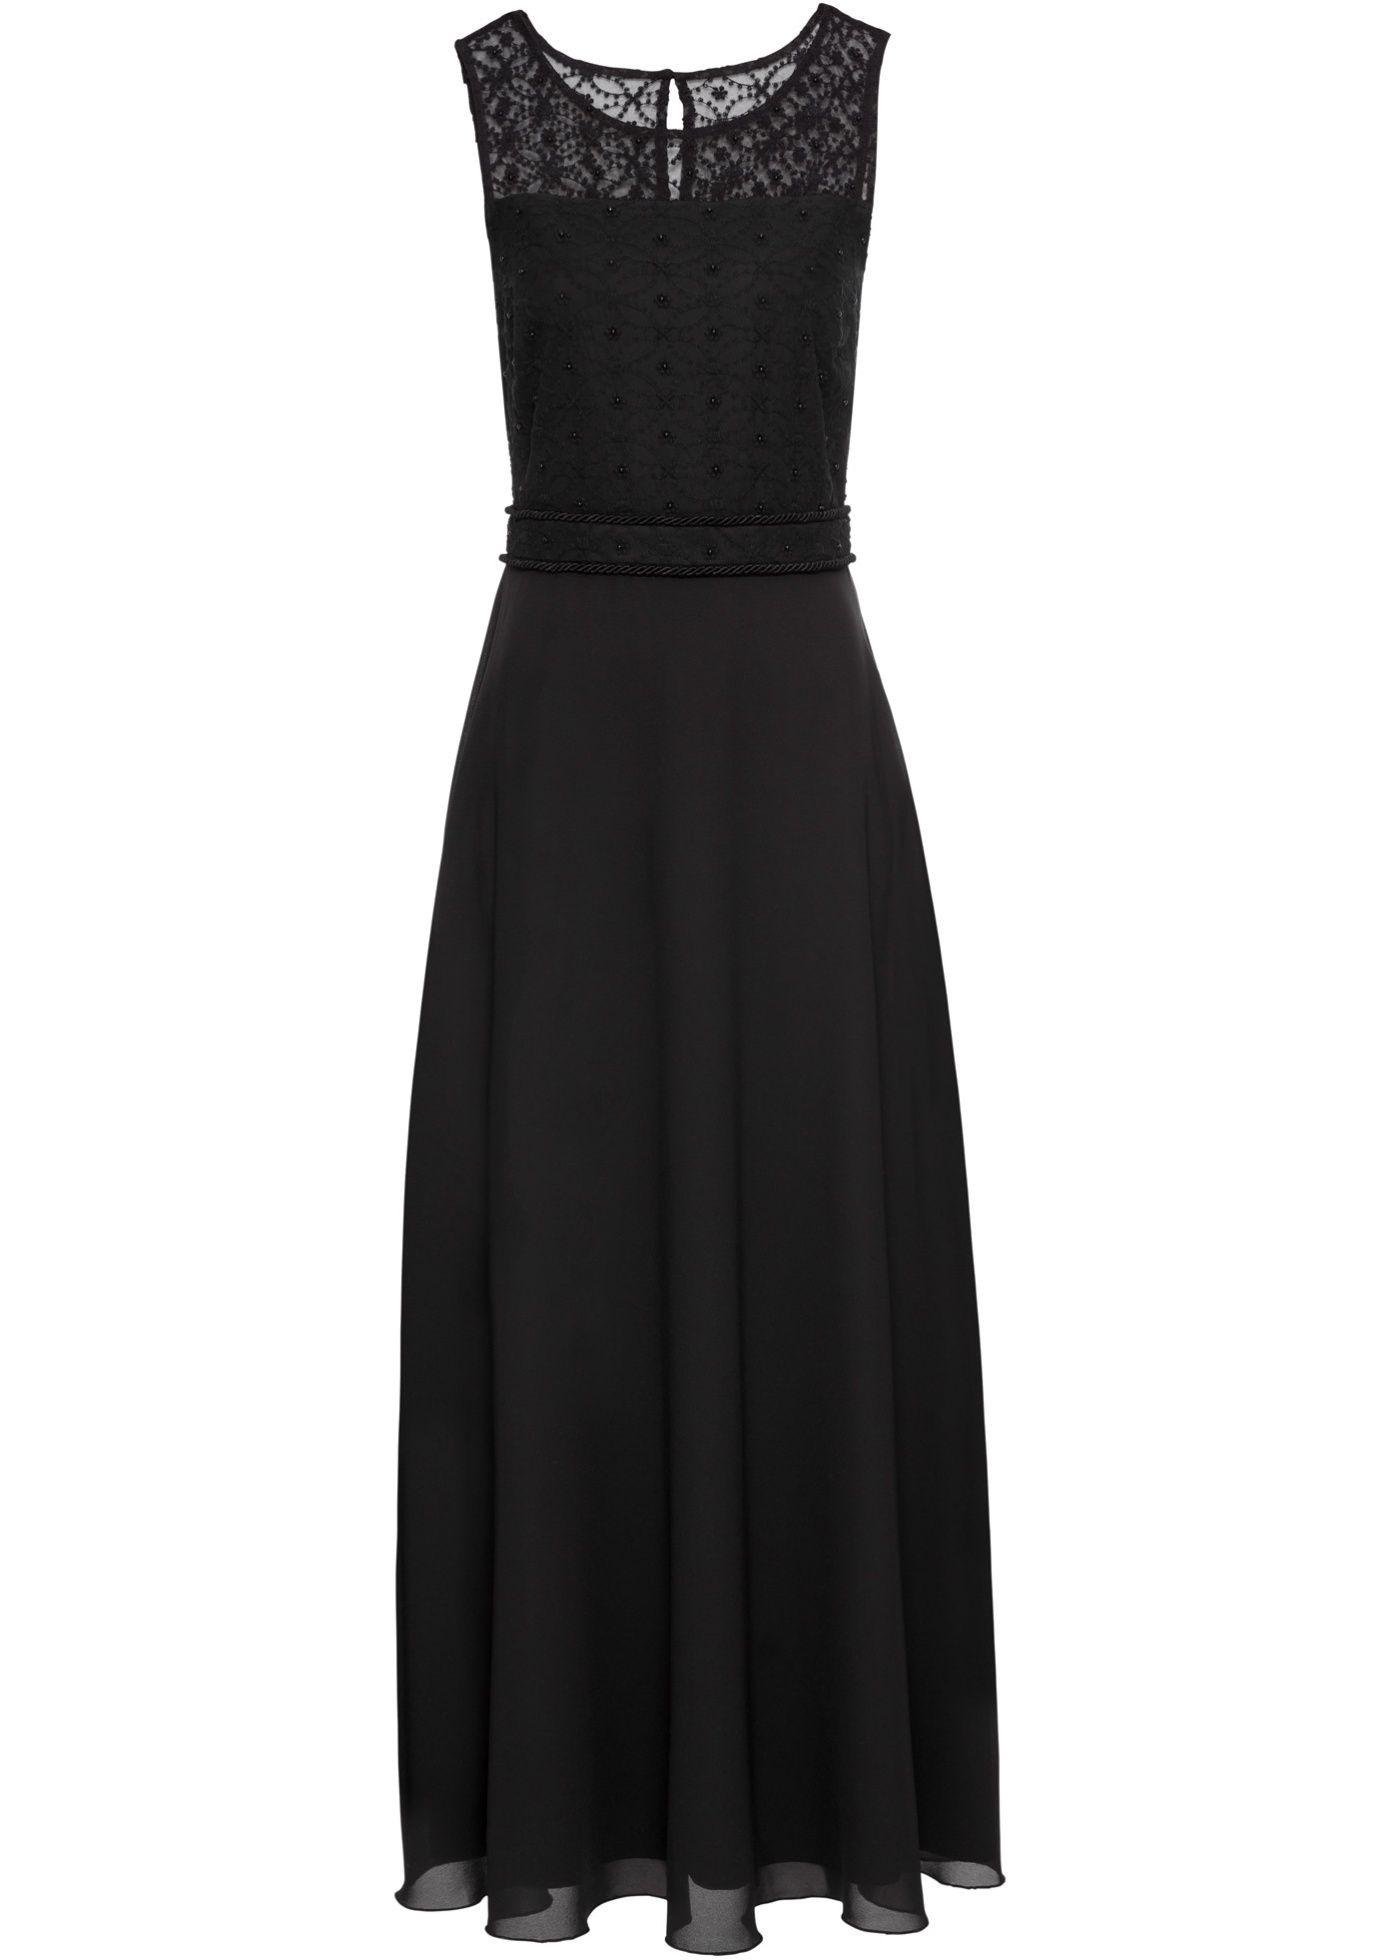 Elegant Niente Abendkleid Schwarz Spezialgebiet15 Einfach Niente Abendkleid Schwarz Galerie